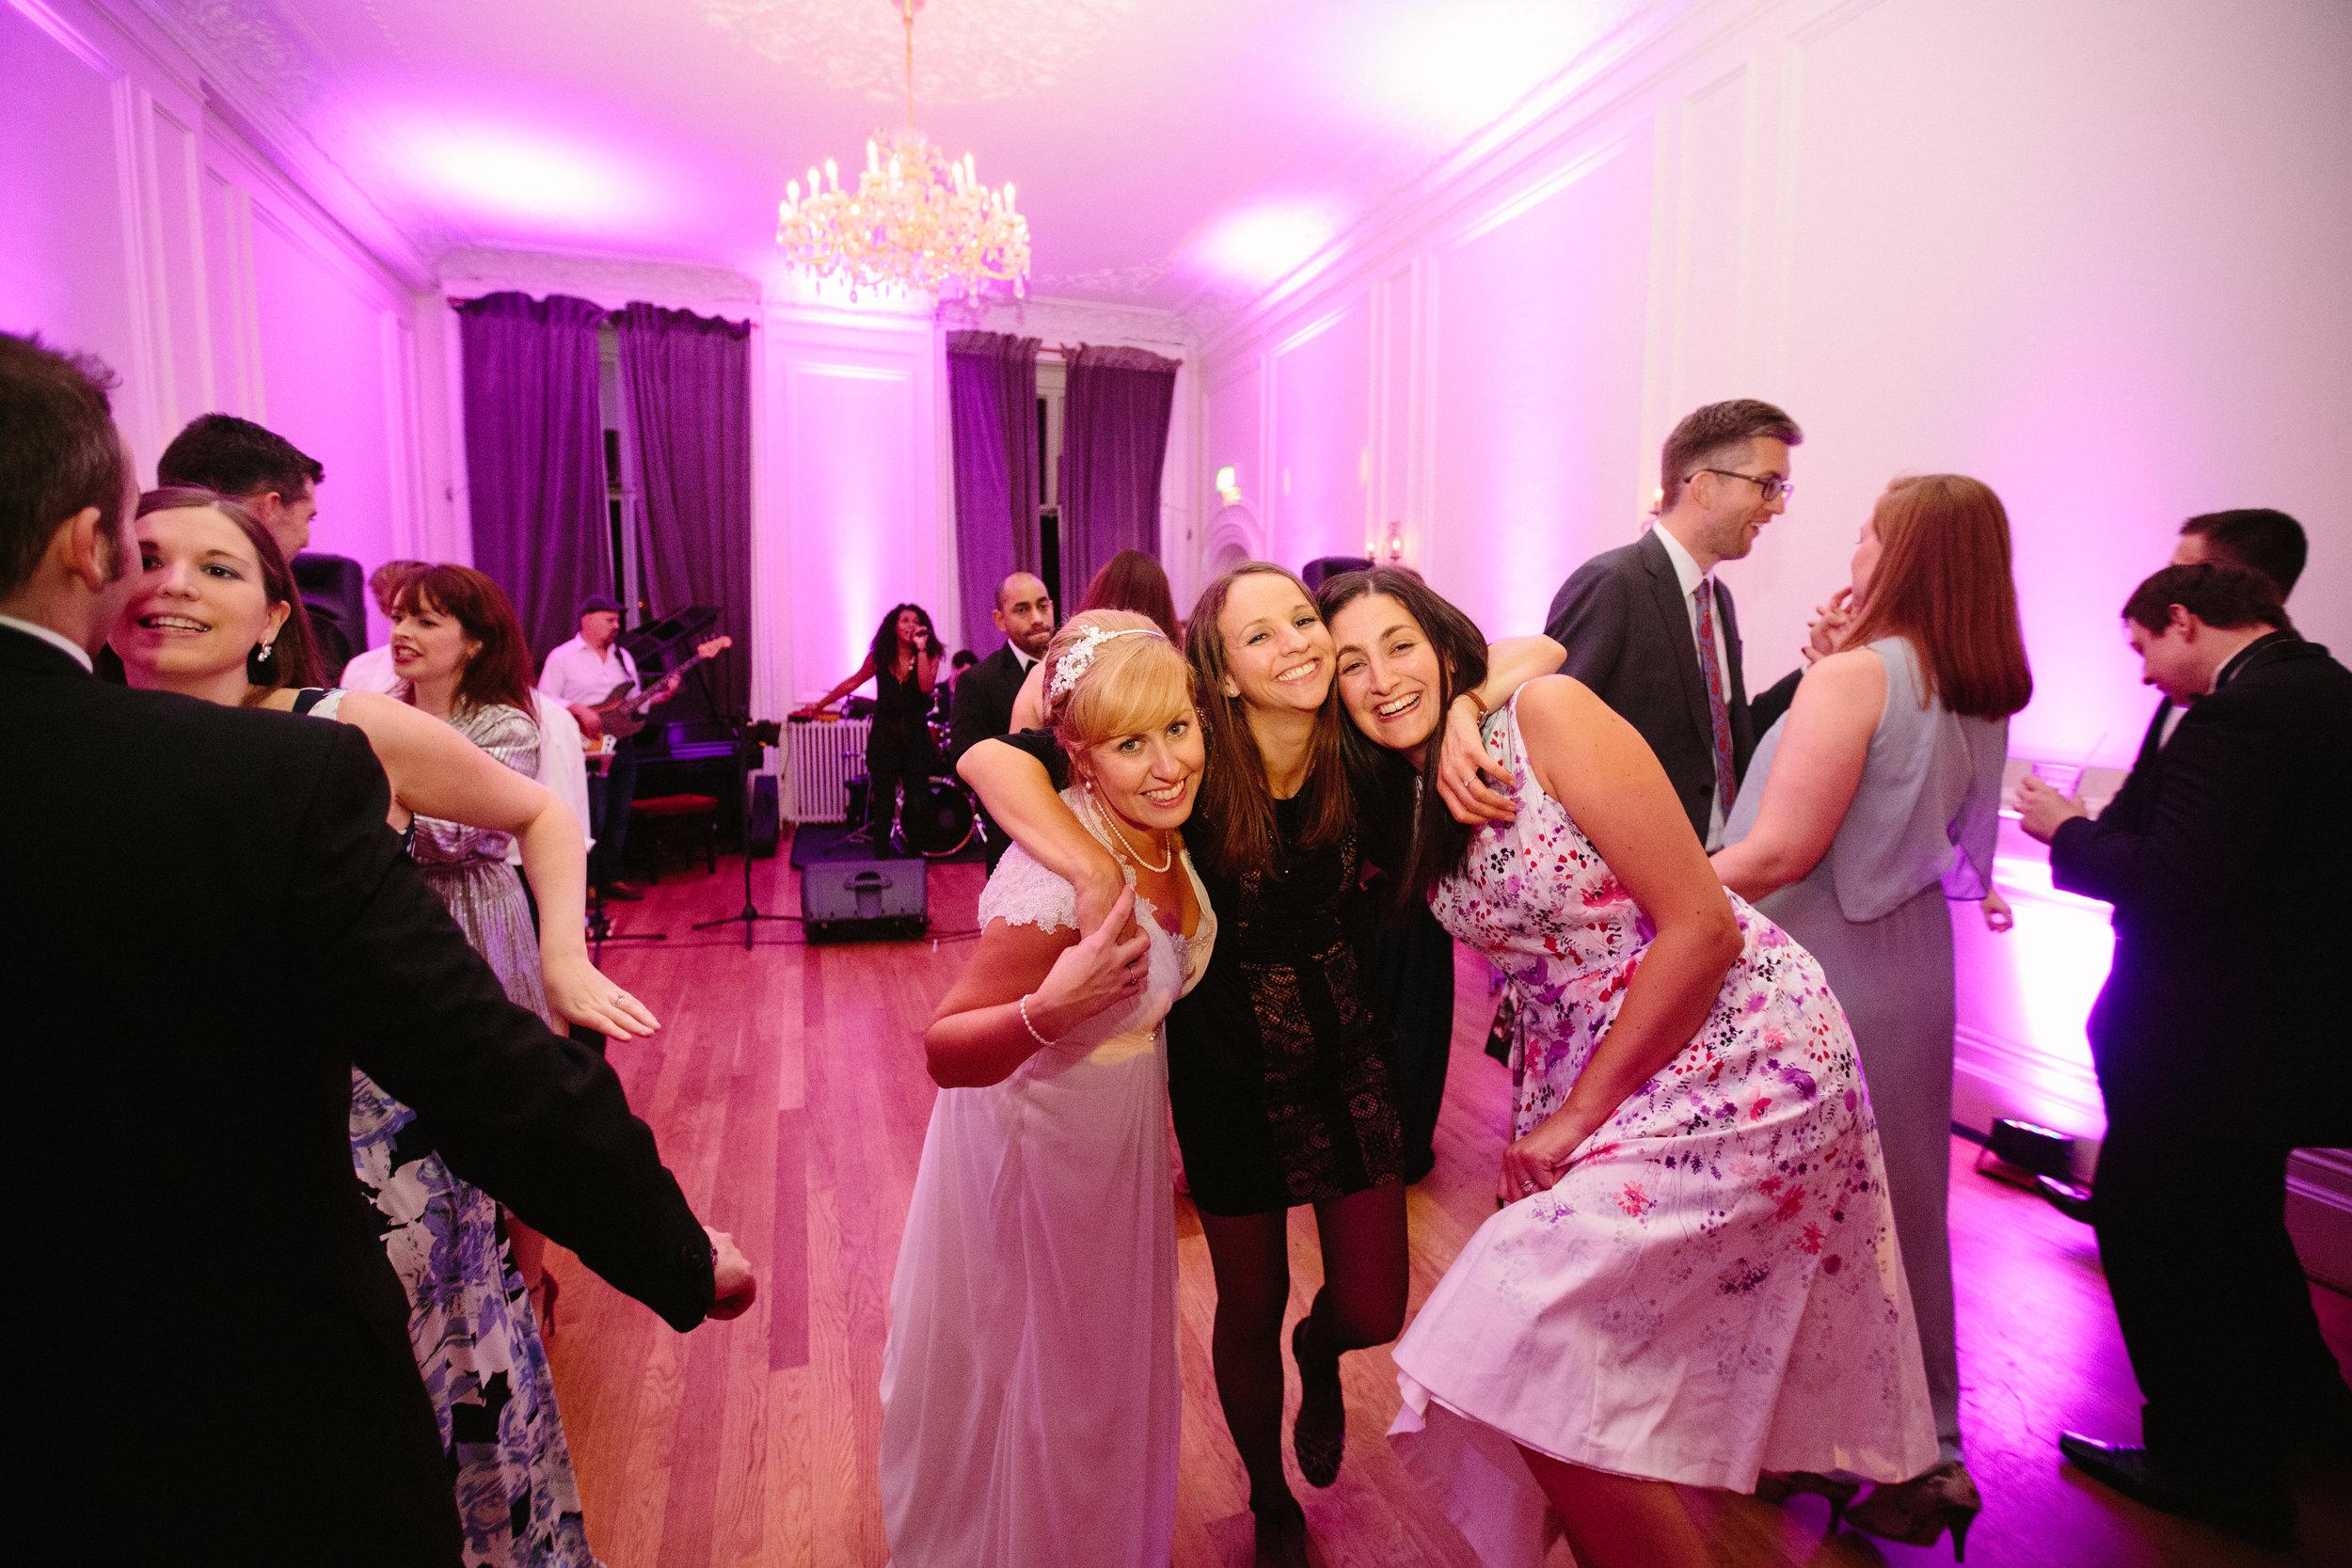 london-wedding-photography-wimbledon-wandsworth-town-hall-savoy-polish-club-kensington-ognisco-party-112